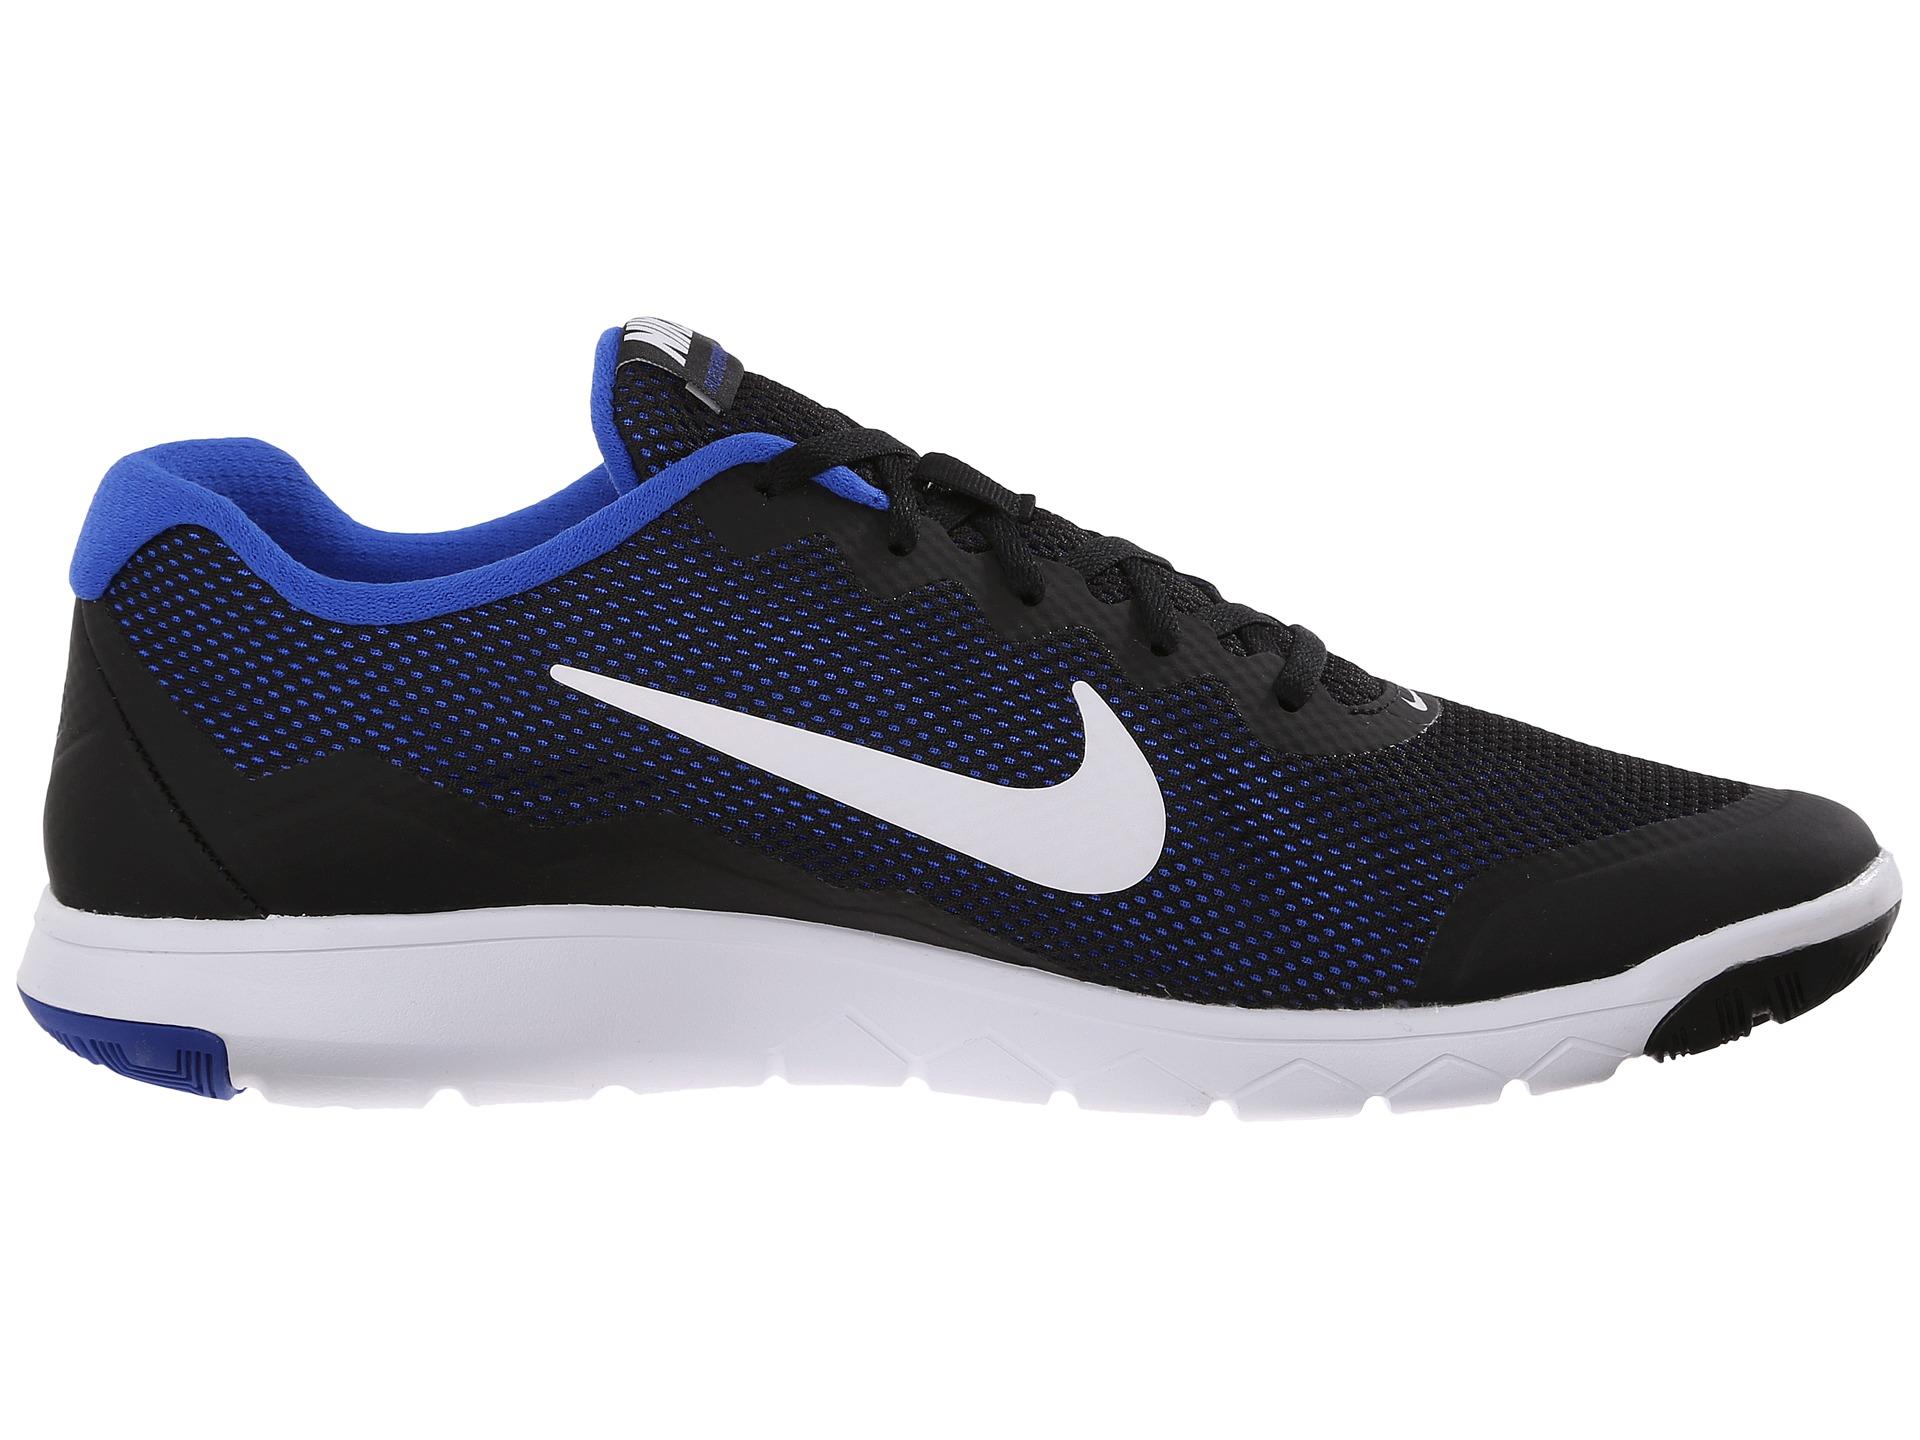 Nike Flex Basketball Shoes